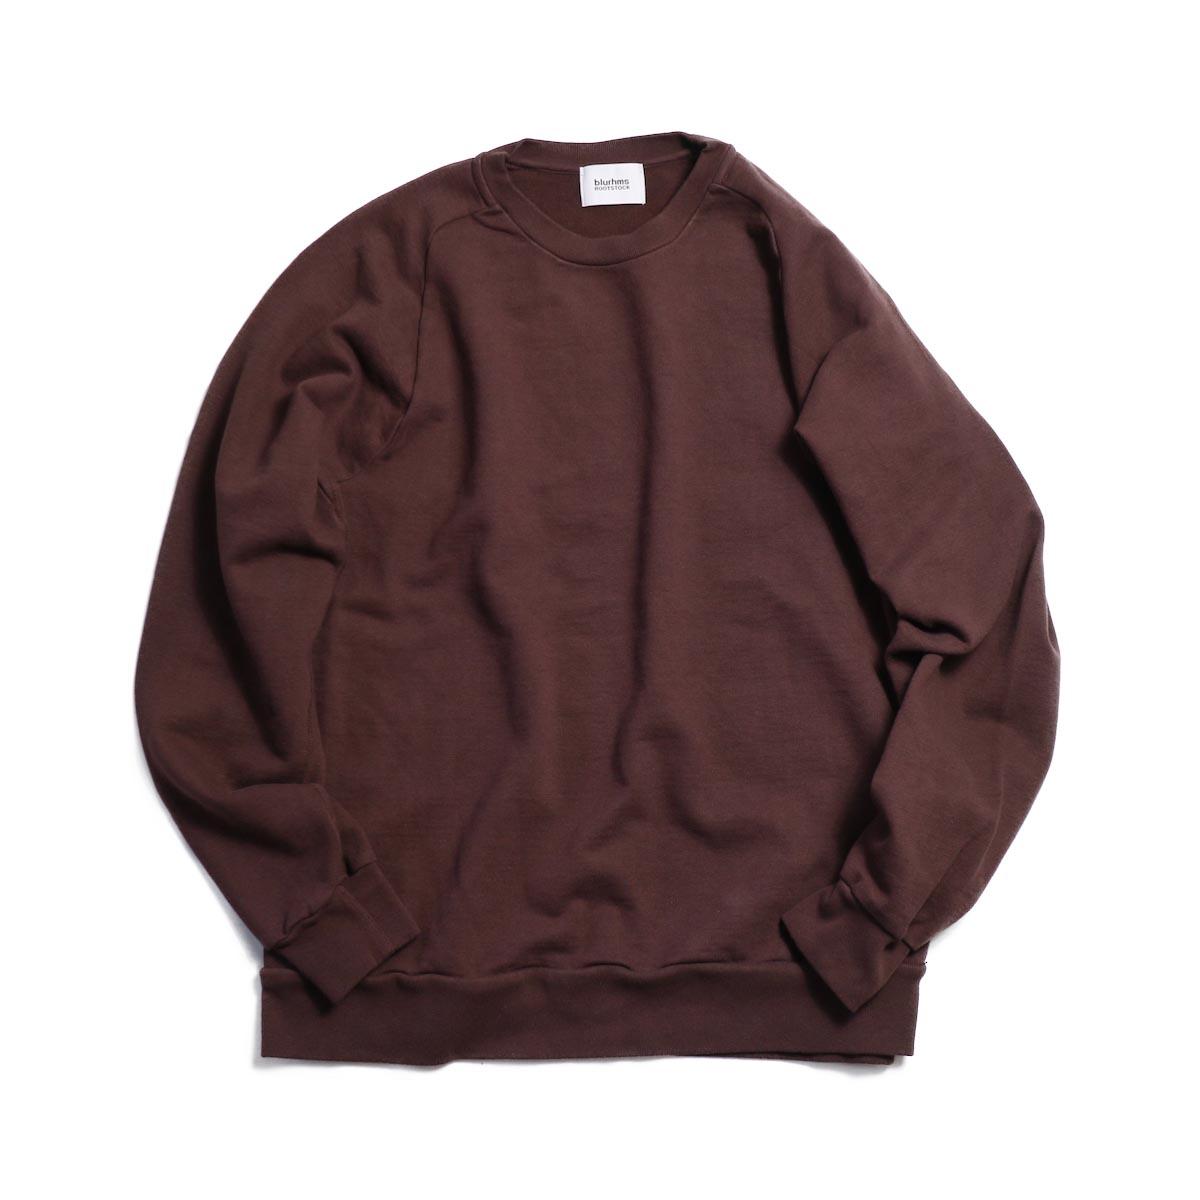 blurhms / Freedom Sleeve Sweat Shirt - Brown